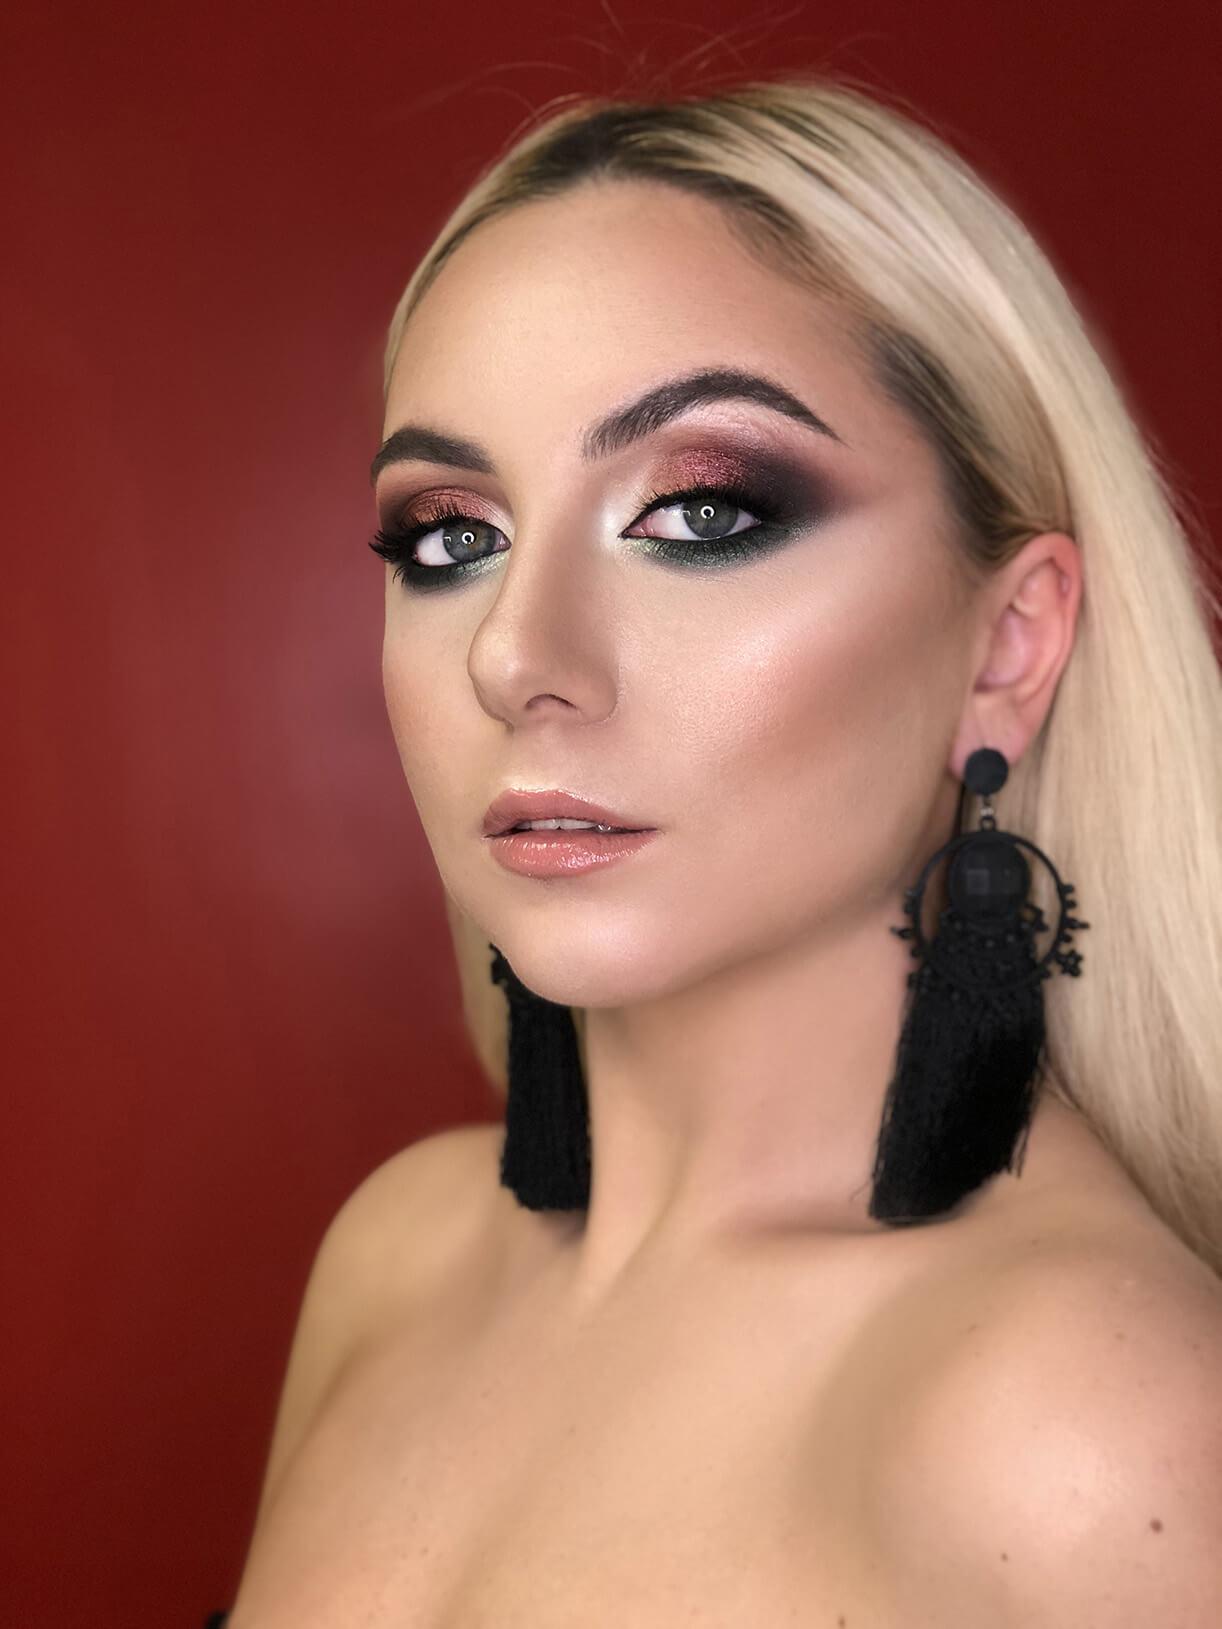 Девушка с ярким вечерним макияжем